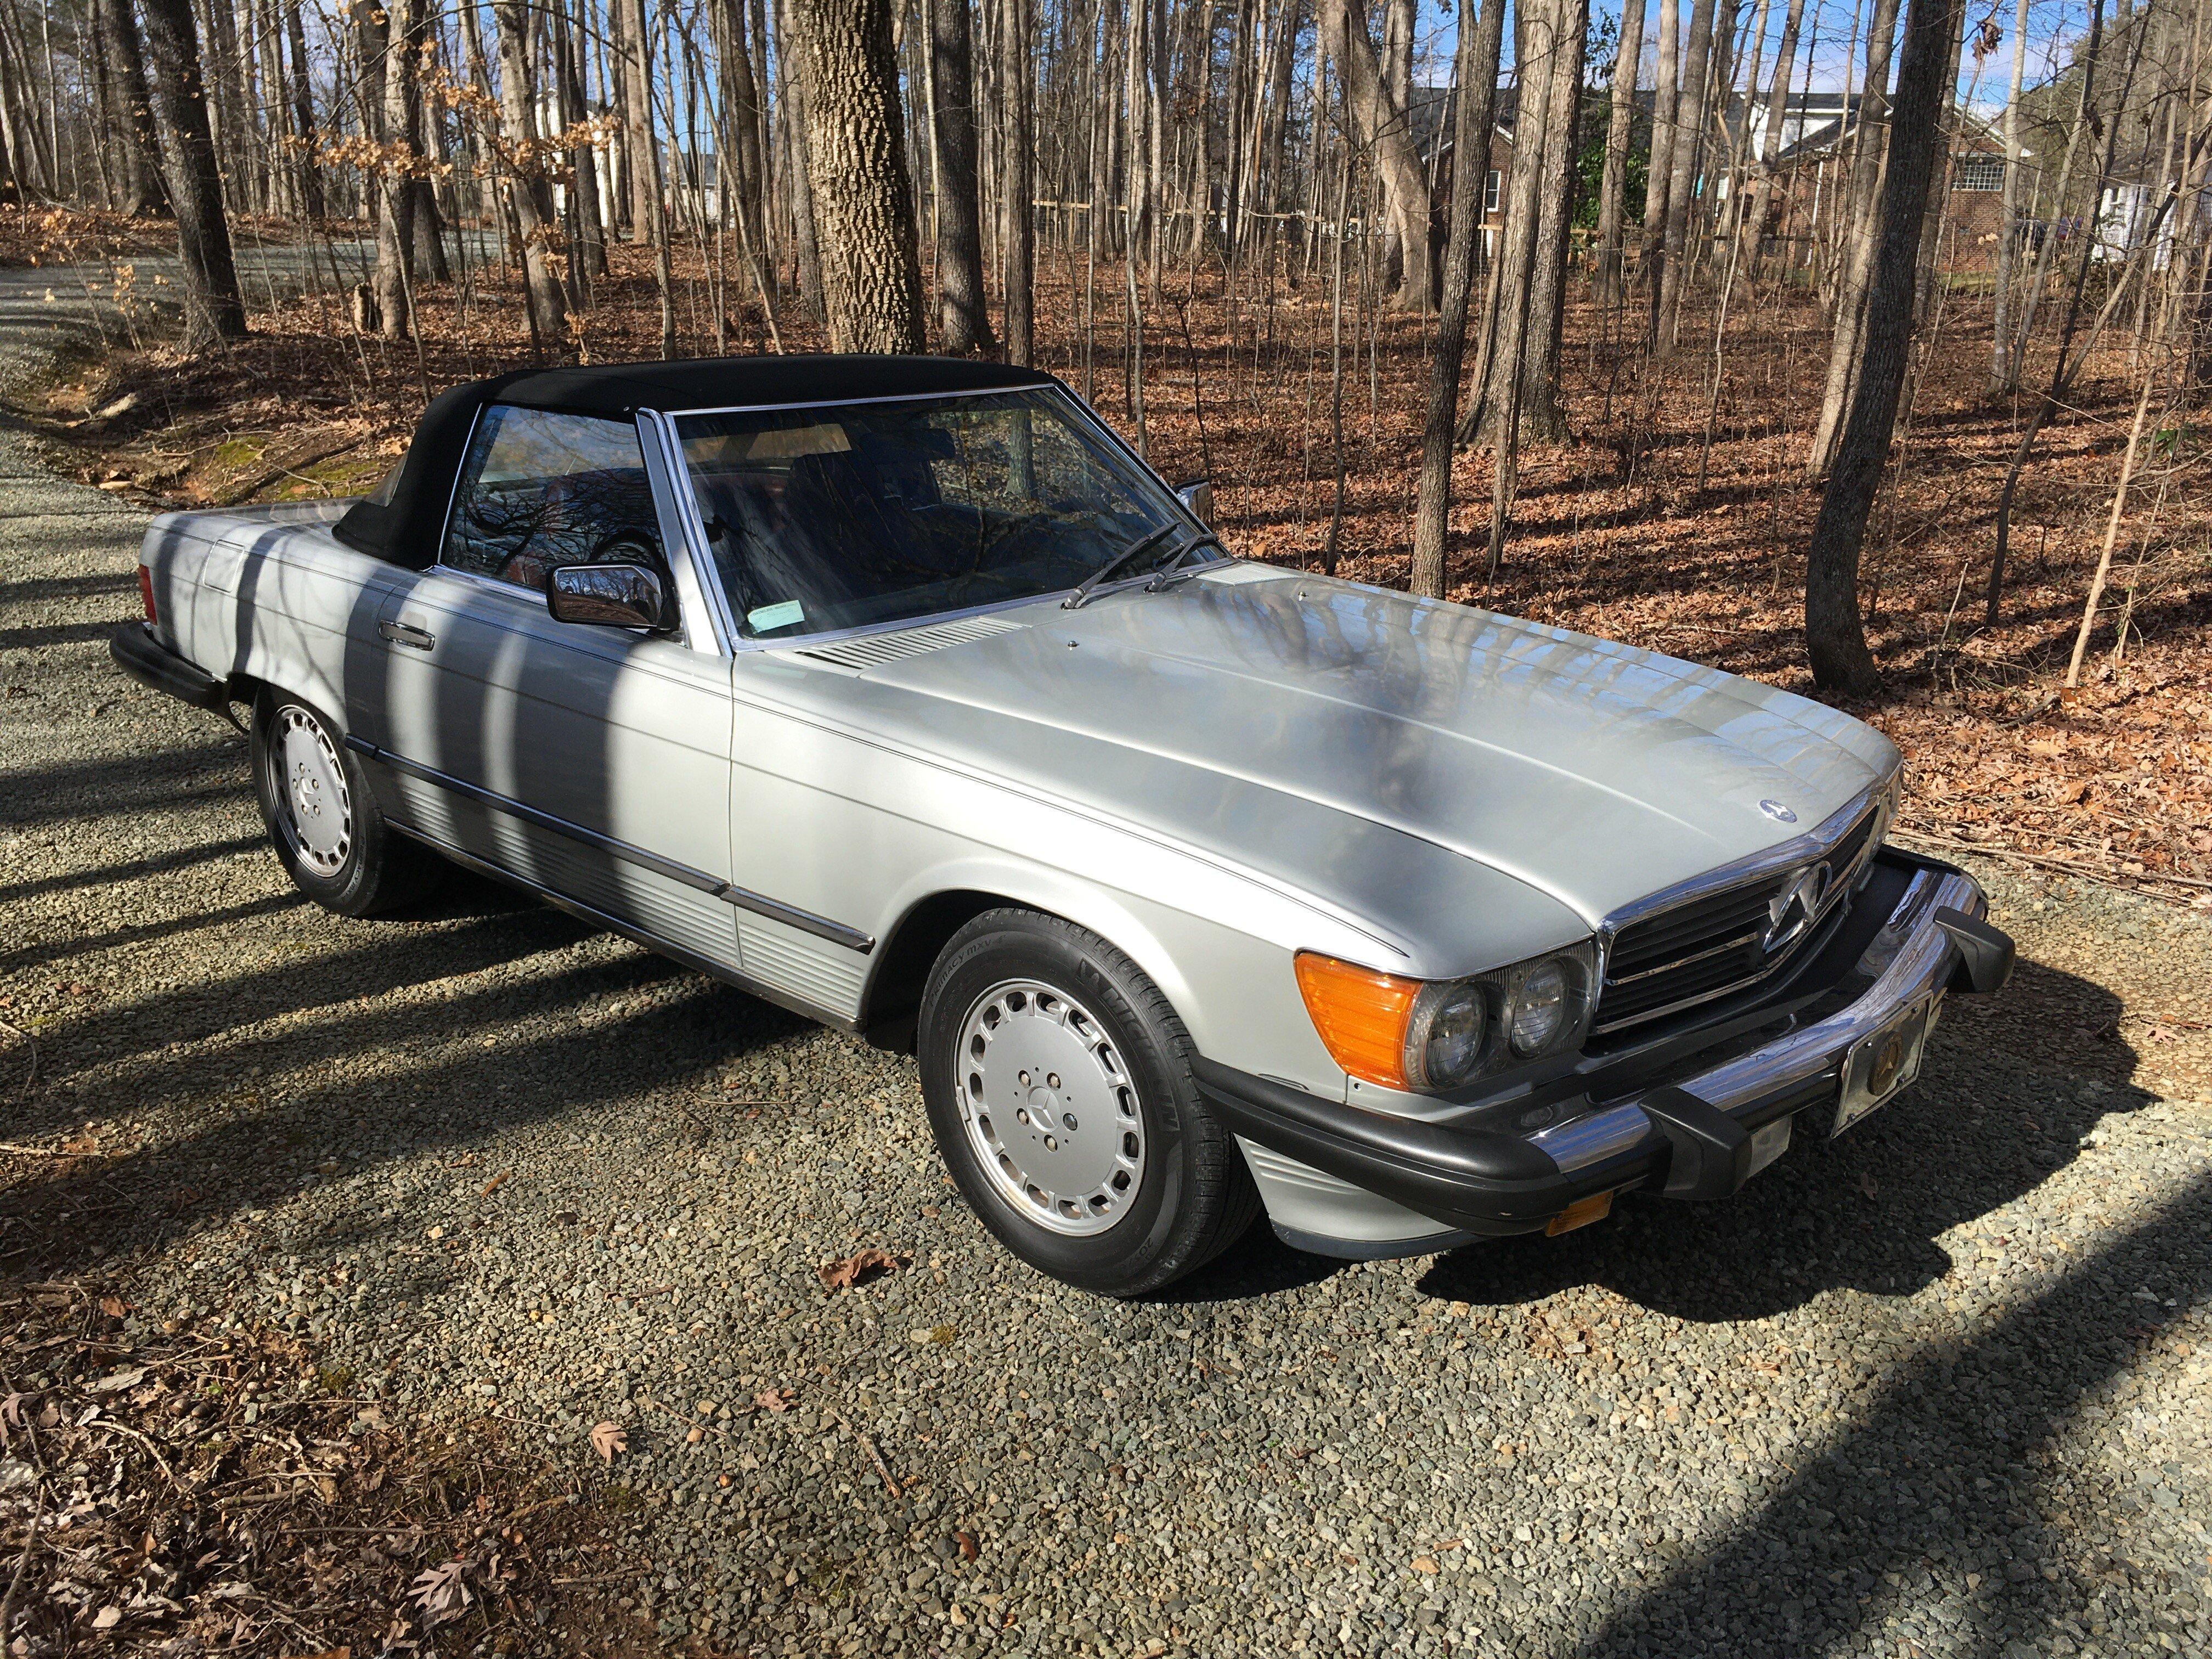 1987 Mercedes Benz 560sl For Sale Near Elon North Carolina 27244 Classics On Autotrader